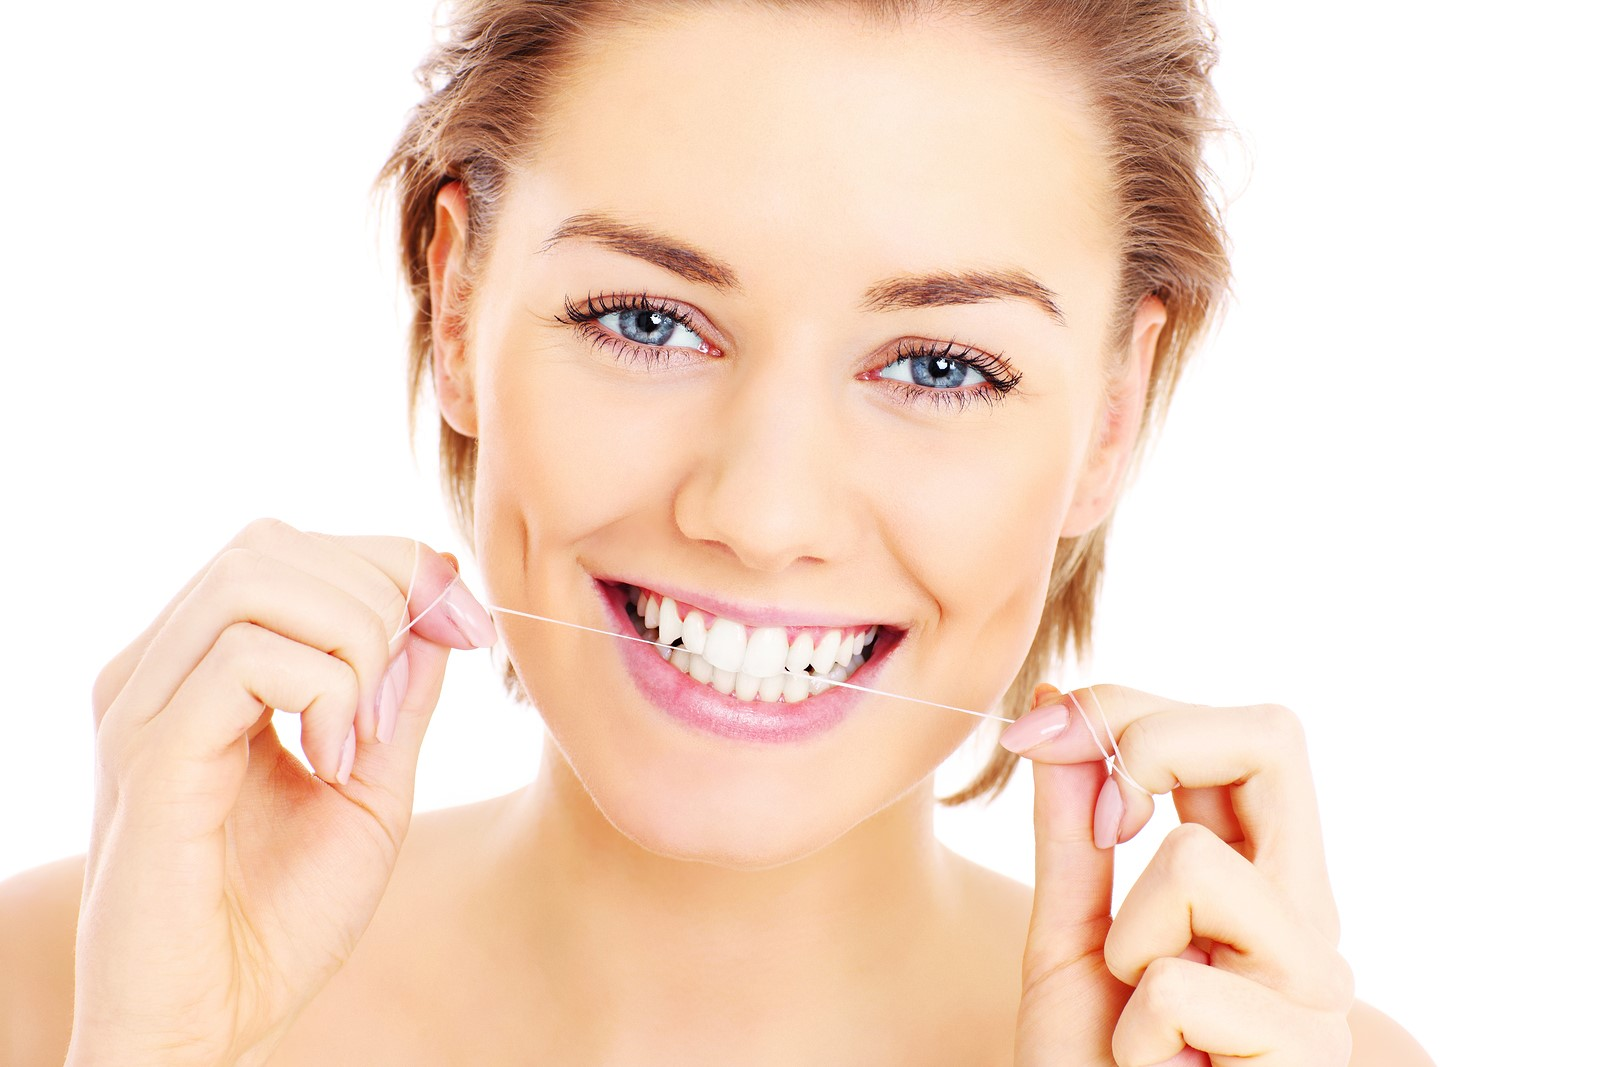 L'igiene orale è fondamentale per la prevenzione di tartaro e carie.